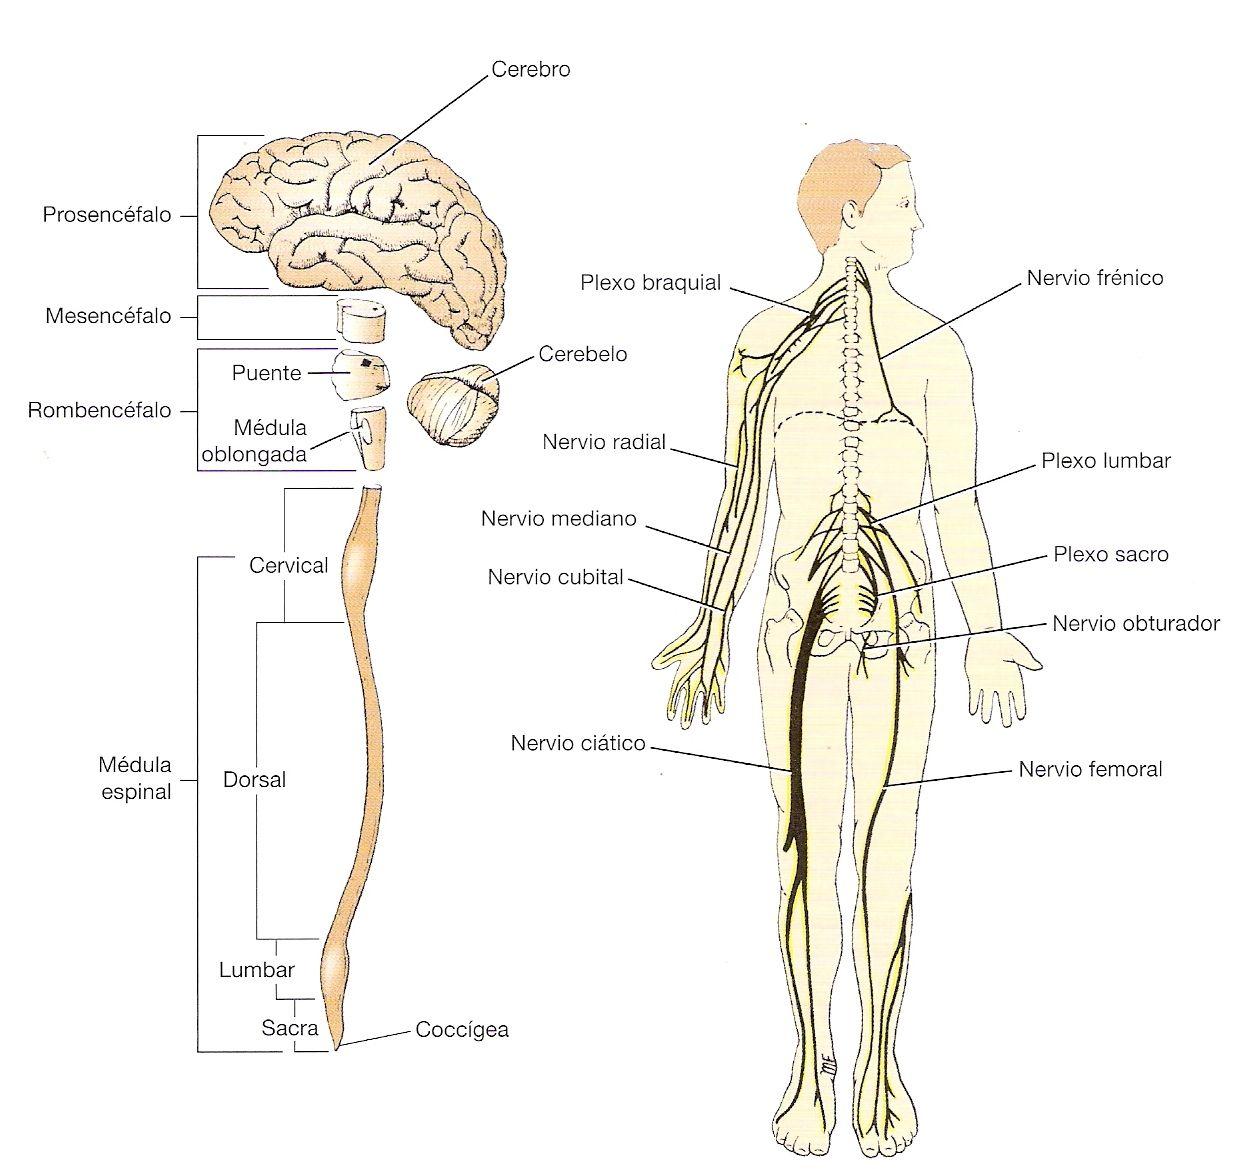 sistema nervioso central | SISTEMAS | Pinterest | Sistema nervioso ...